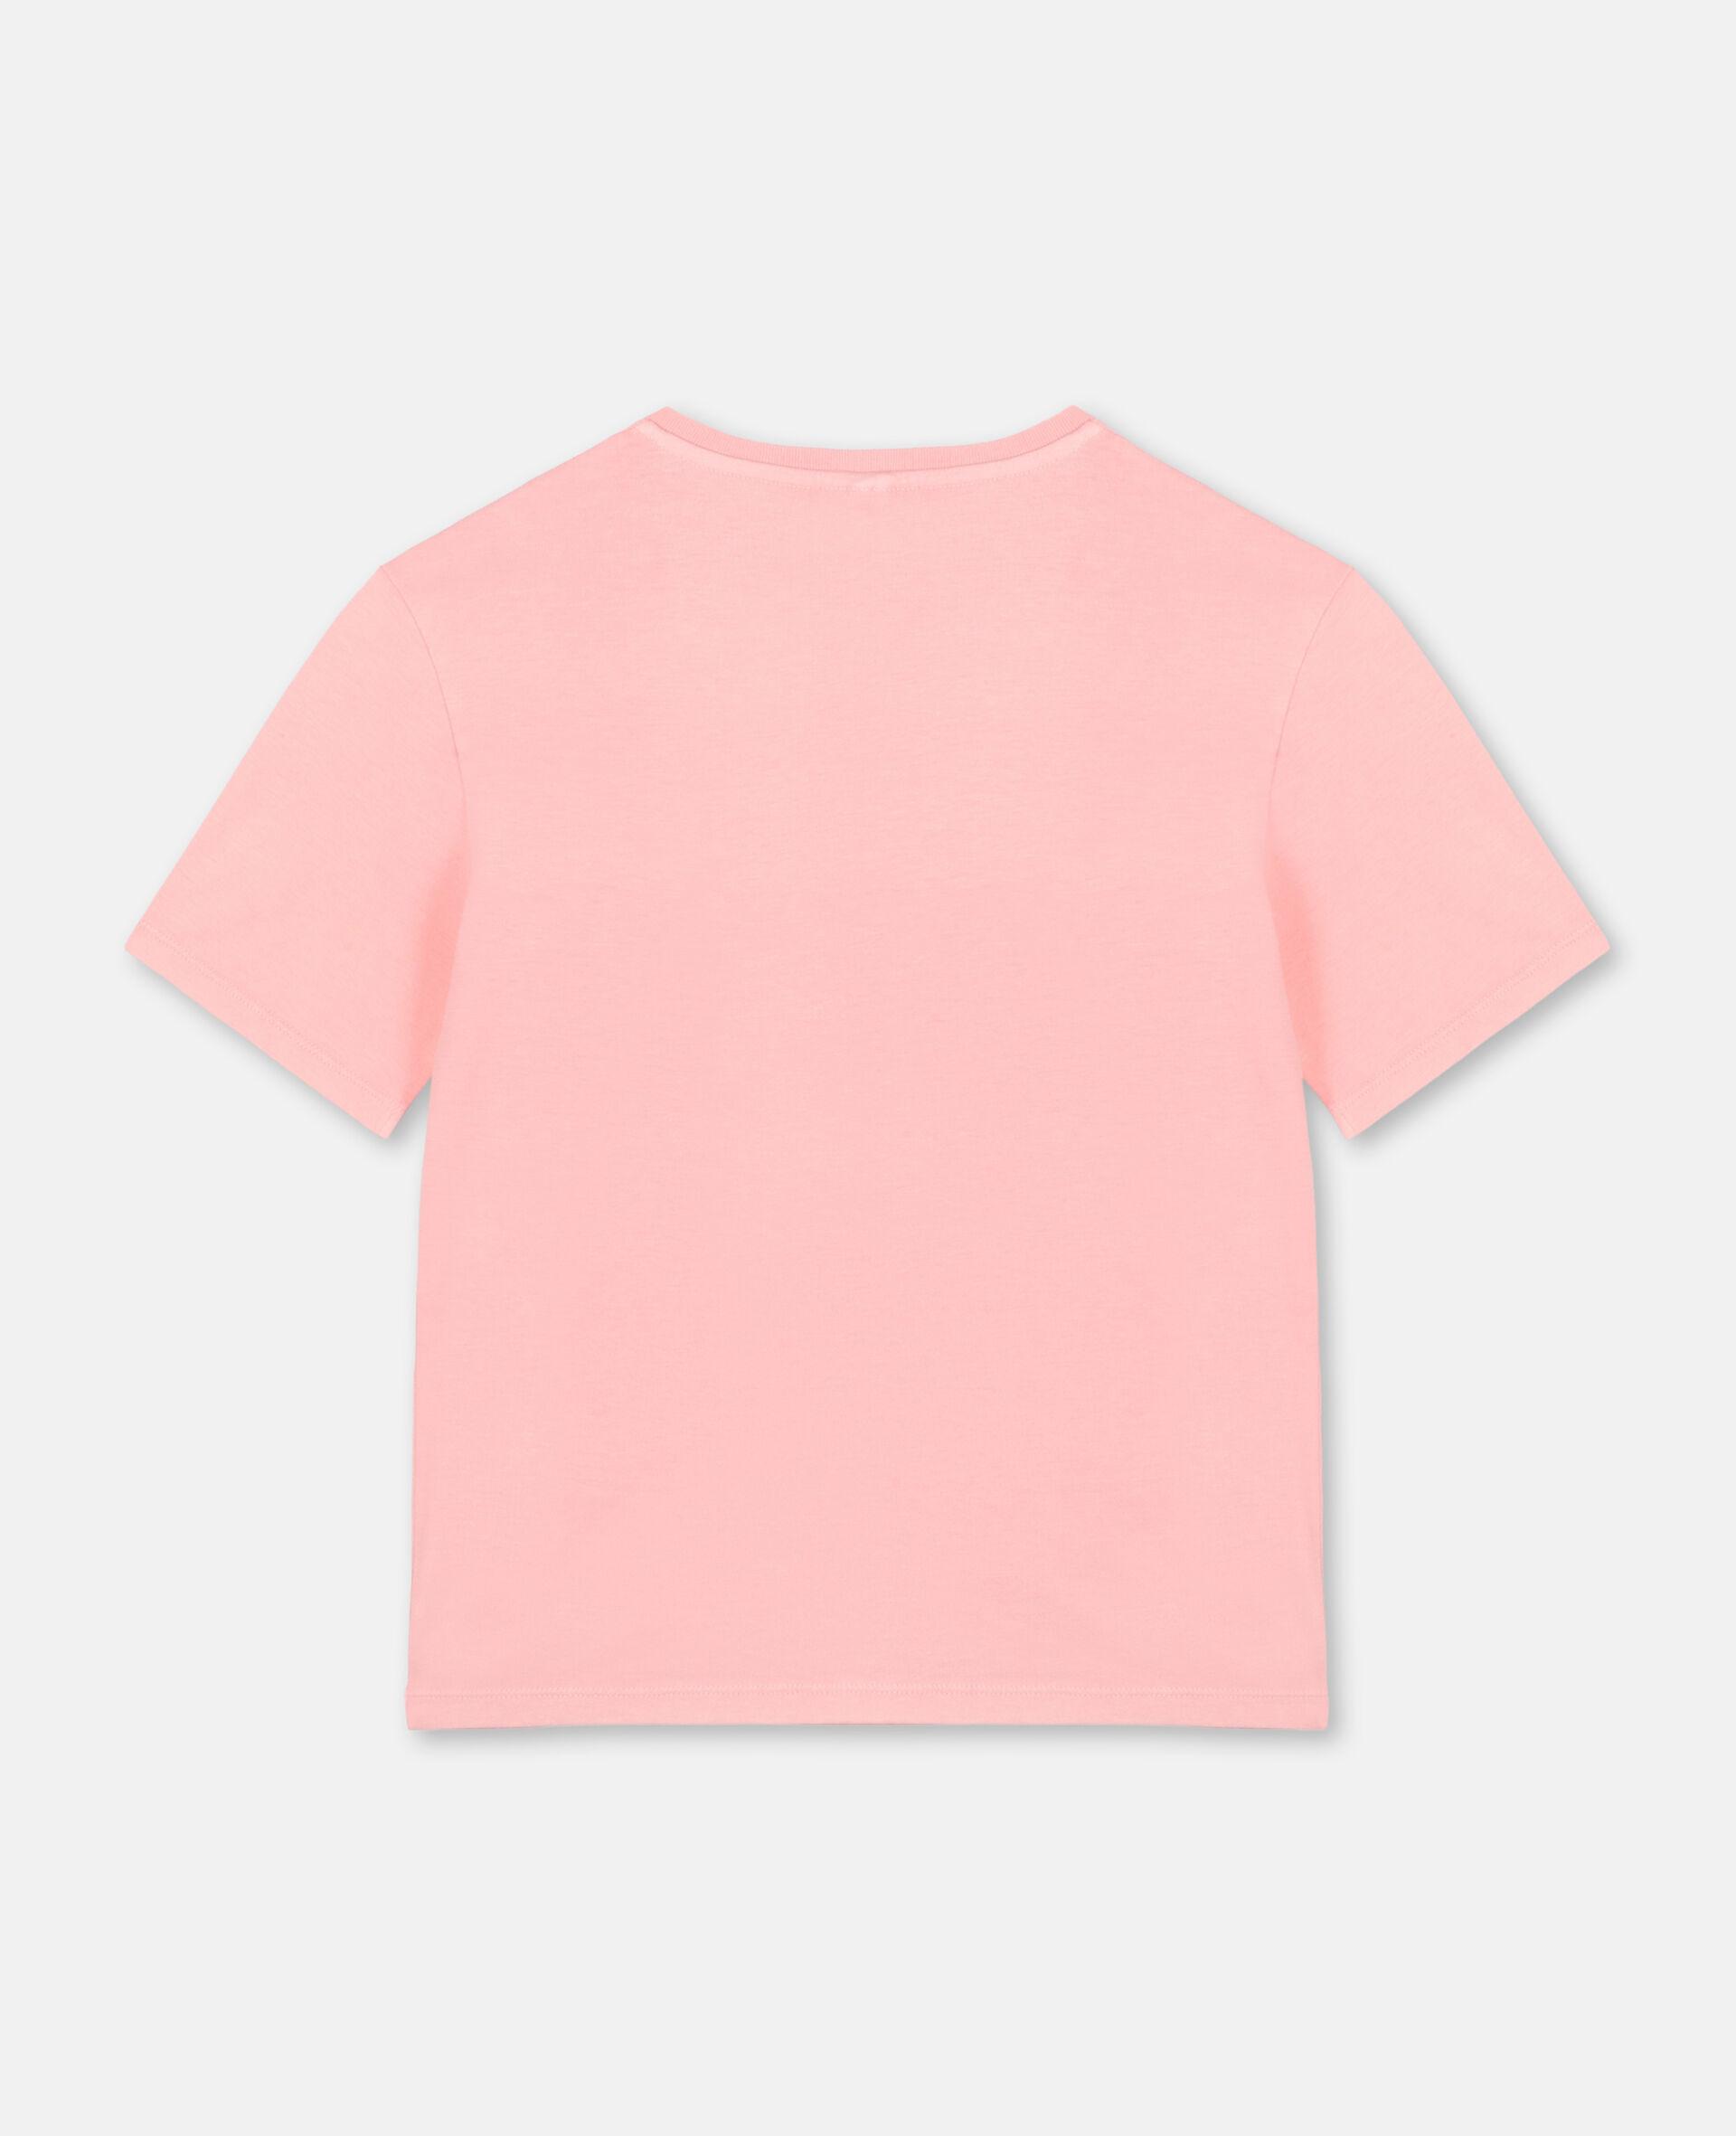 Palm阔型棉质Logo T恤-粉色-large image number 3